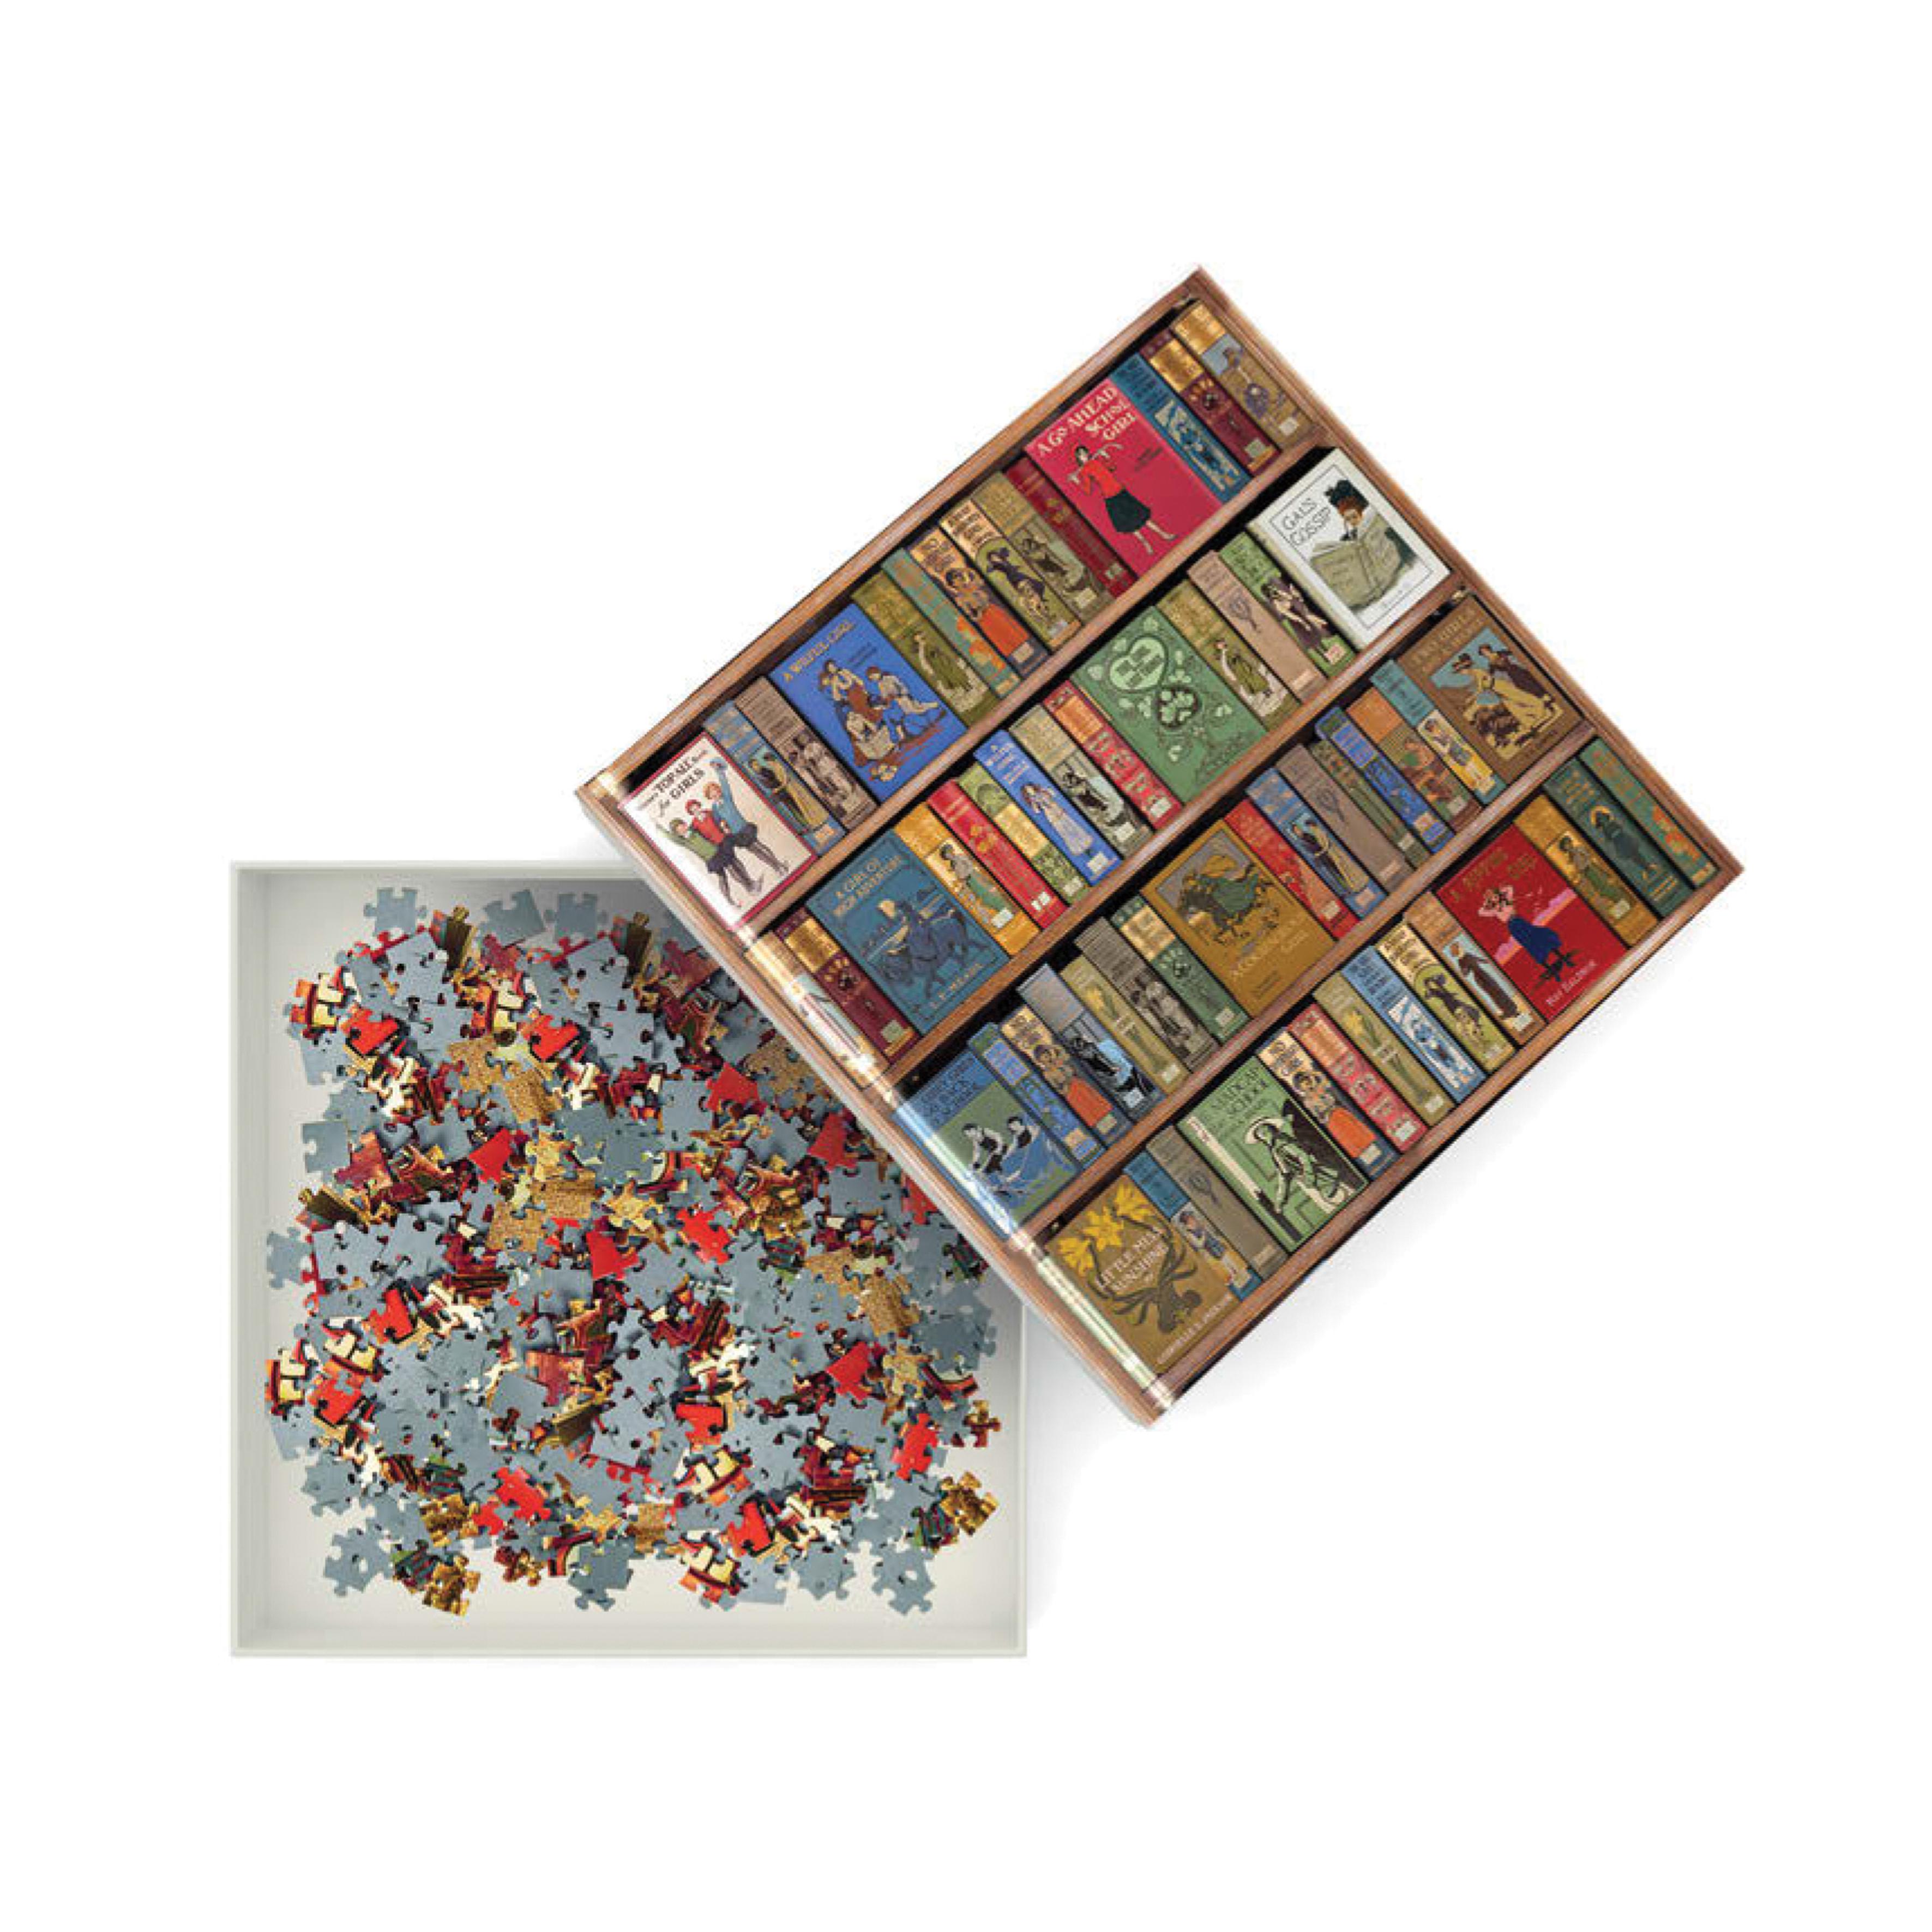 Bookshelves jigsaw puzzle